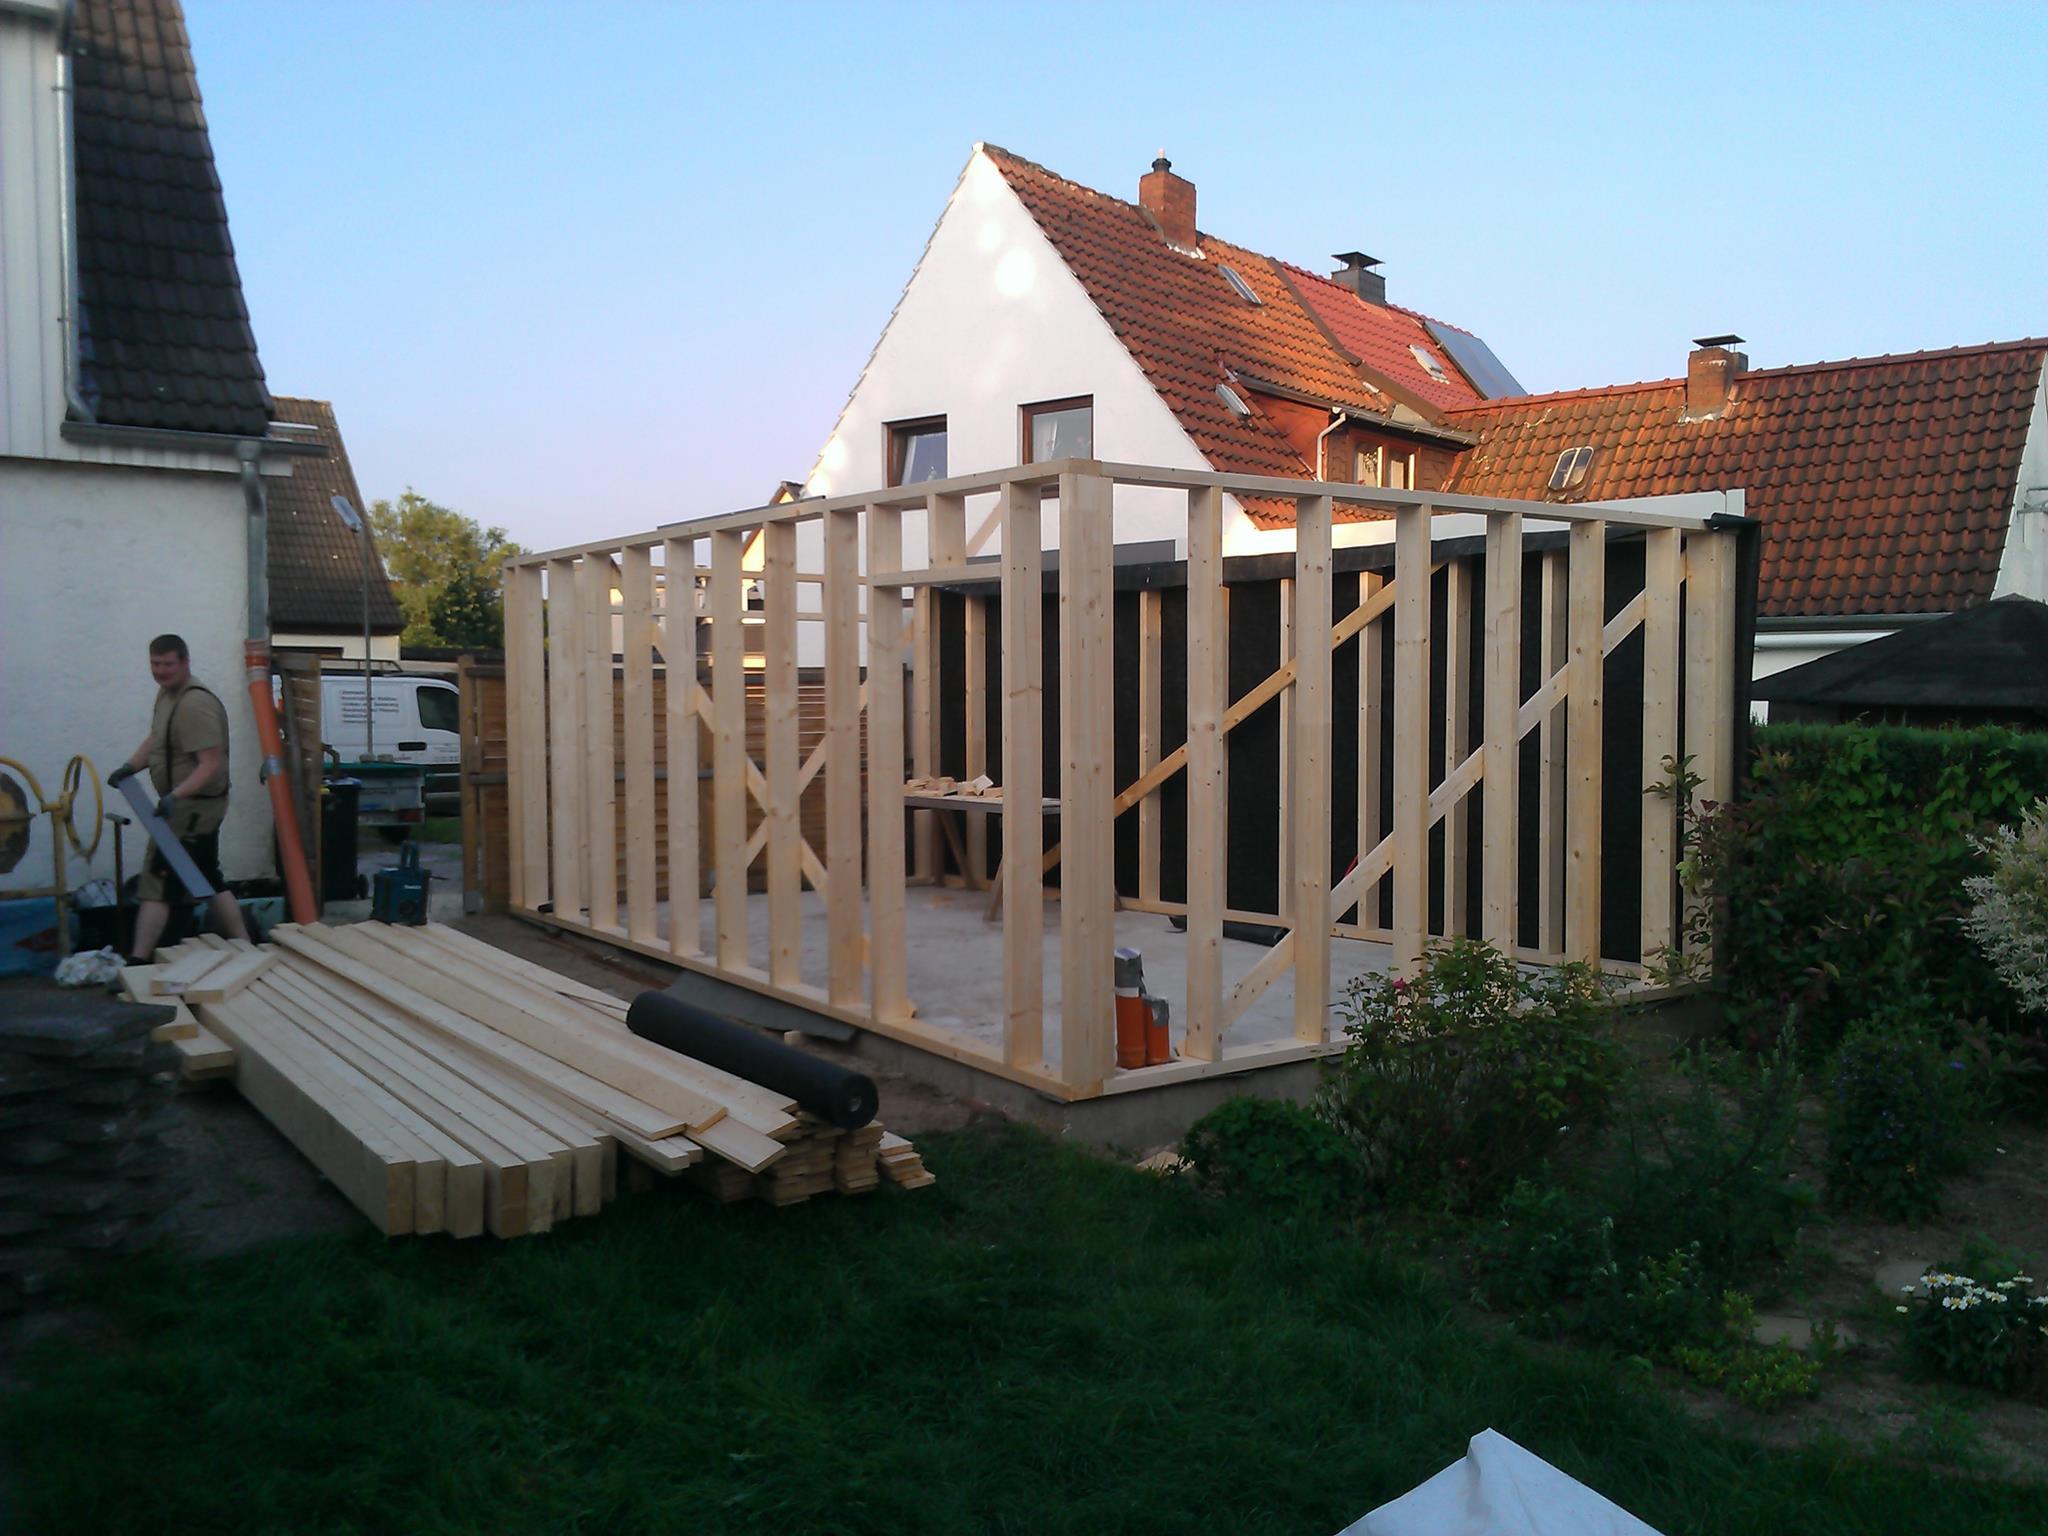 Holzrahmenbau konstruktion  Holzrahmenbau Holzbau Frese in Bremen Ihr Partner im Holzbau und ...